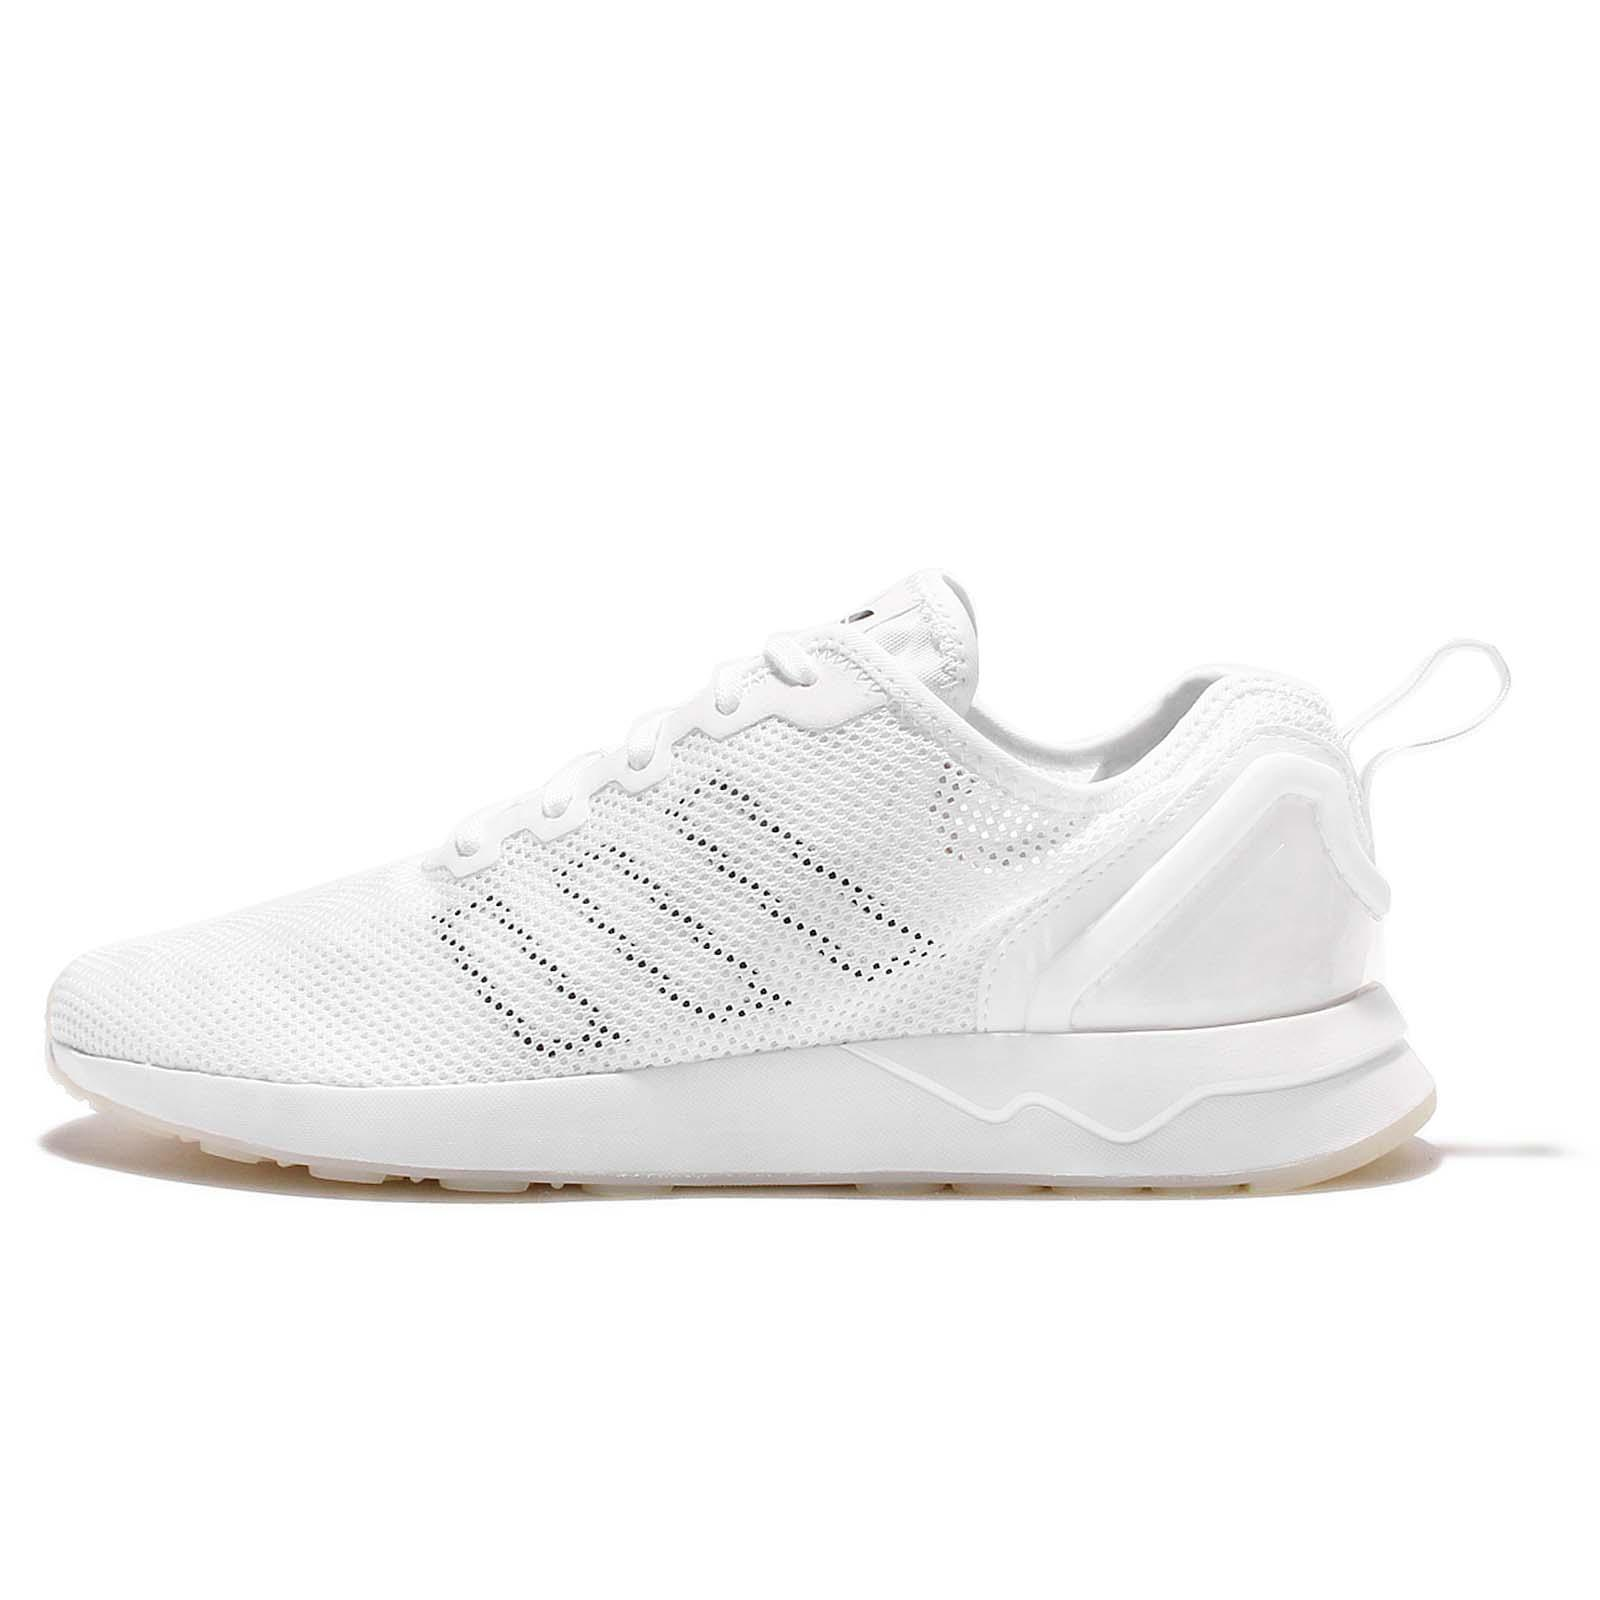 Adidas Zx Flux Adv Sl